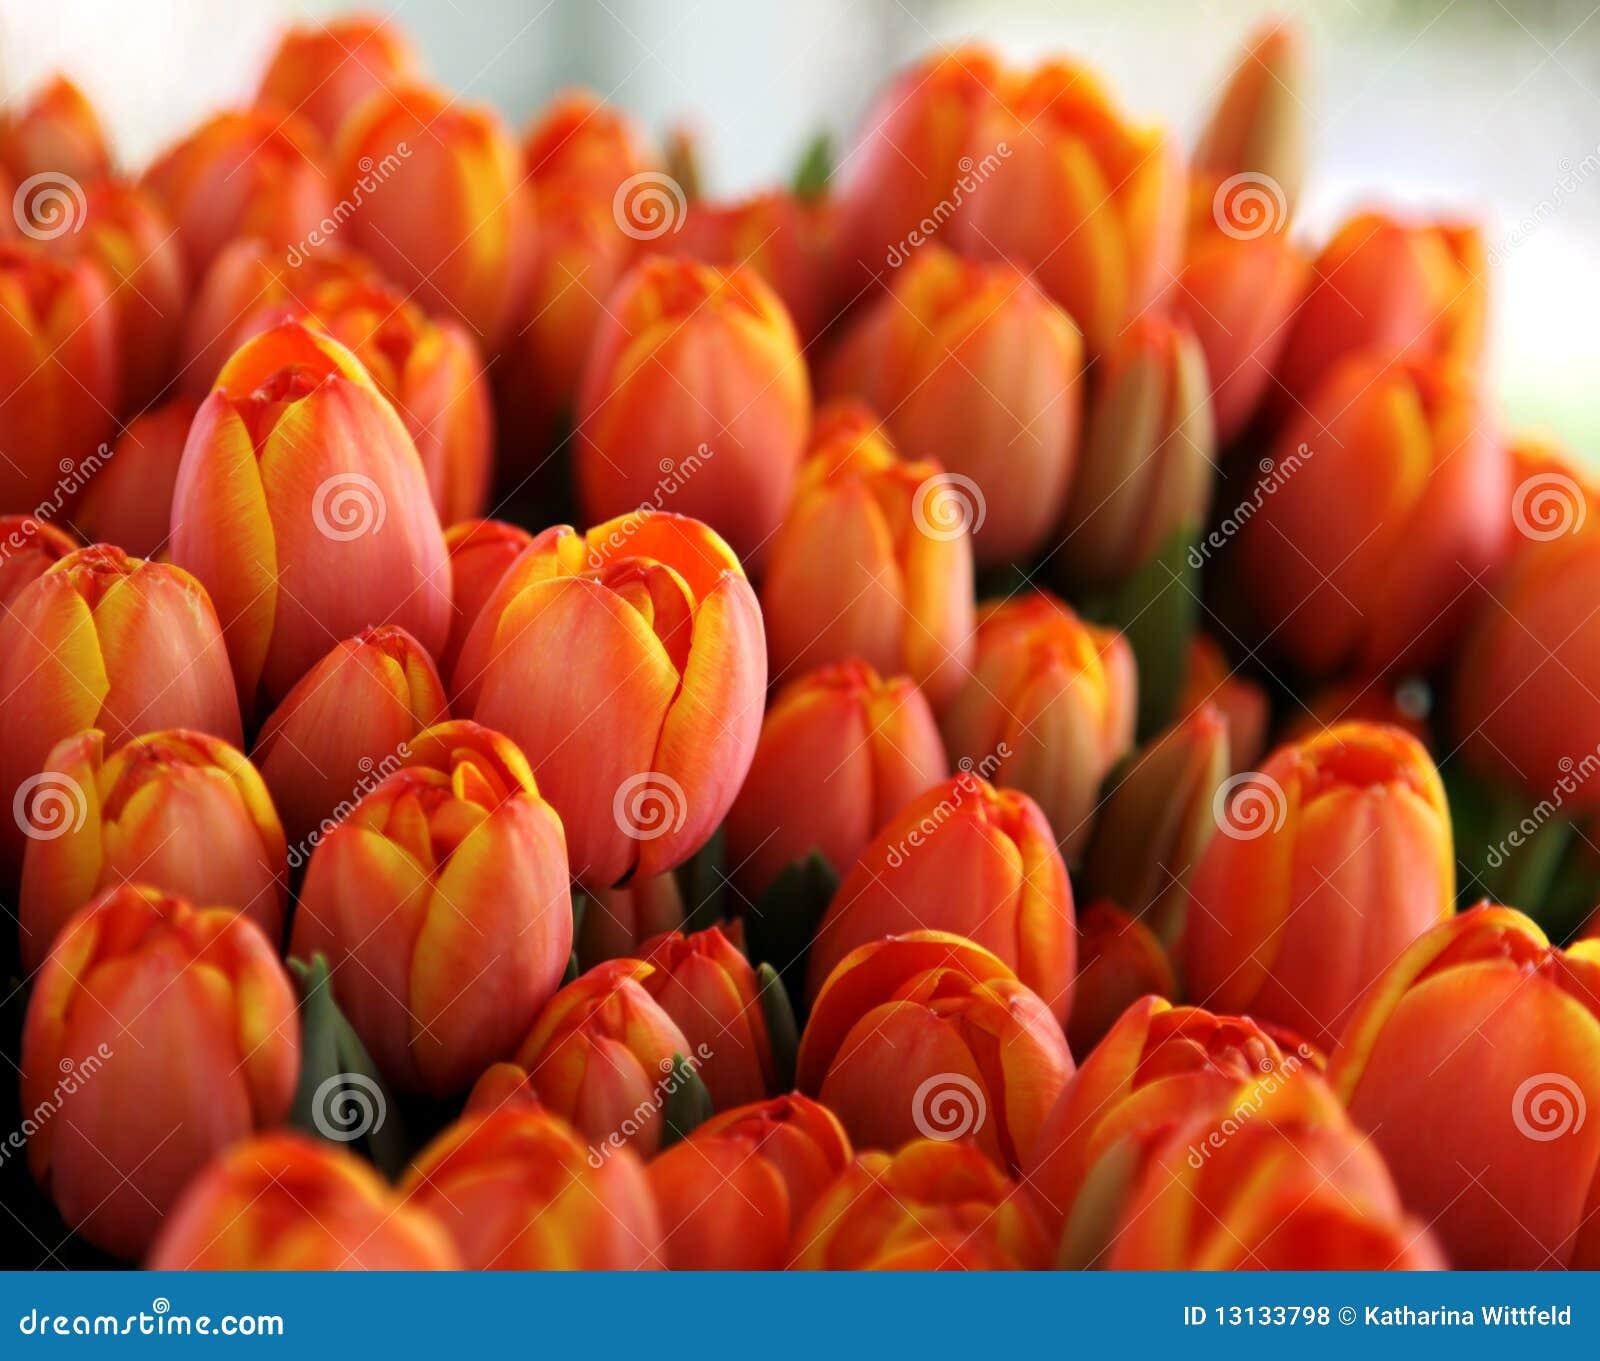 Mazzo di tulipani arancioni e gialli fotografia stock for Tulipani arancioni